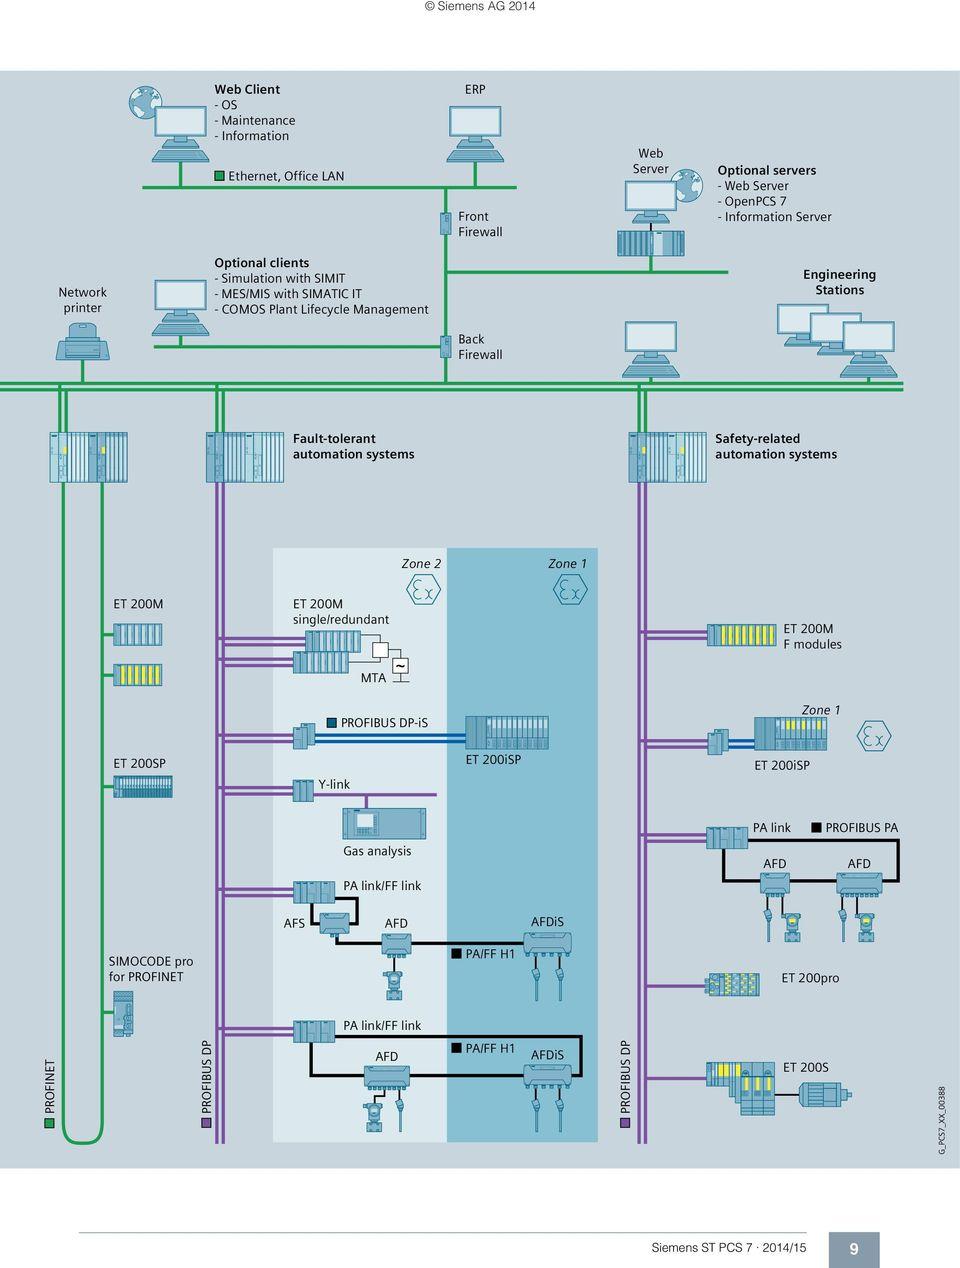 hight resolution of automation systems zone 2 zone 1 et 200m et 200m single redundant et 200m f